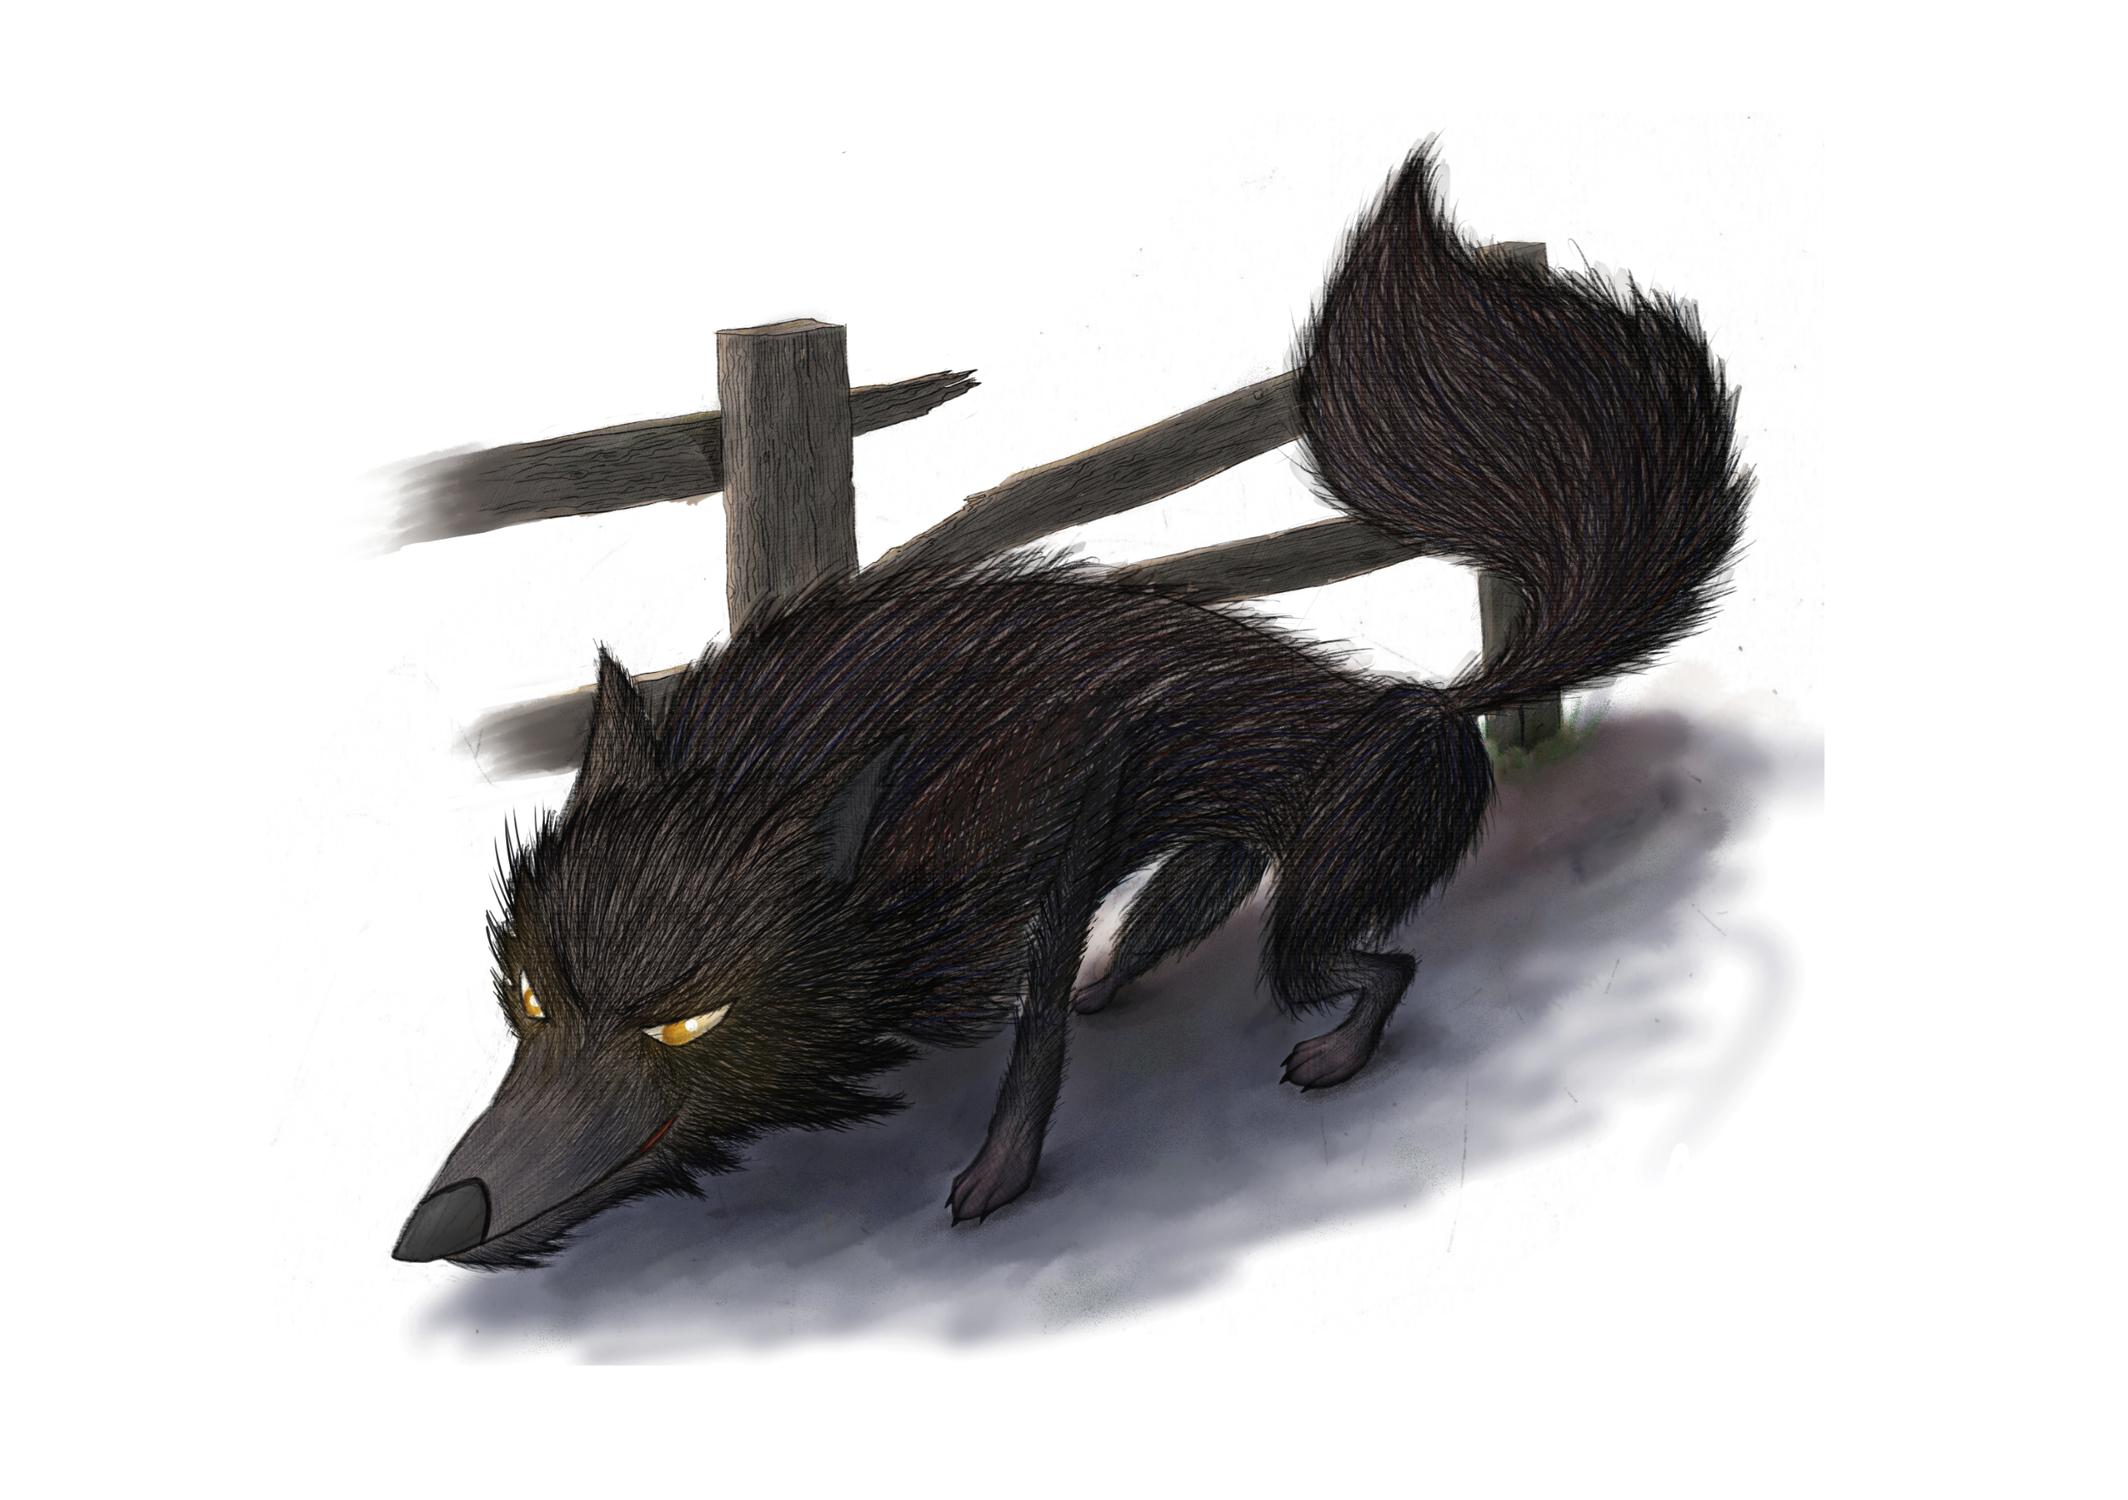 Big Bad Wolf Artwork by Julian Beresford